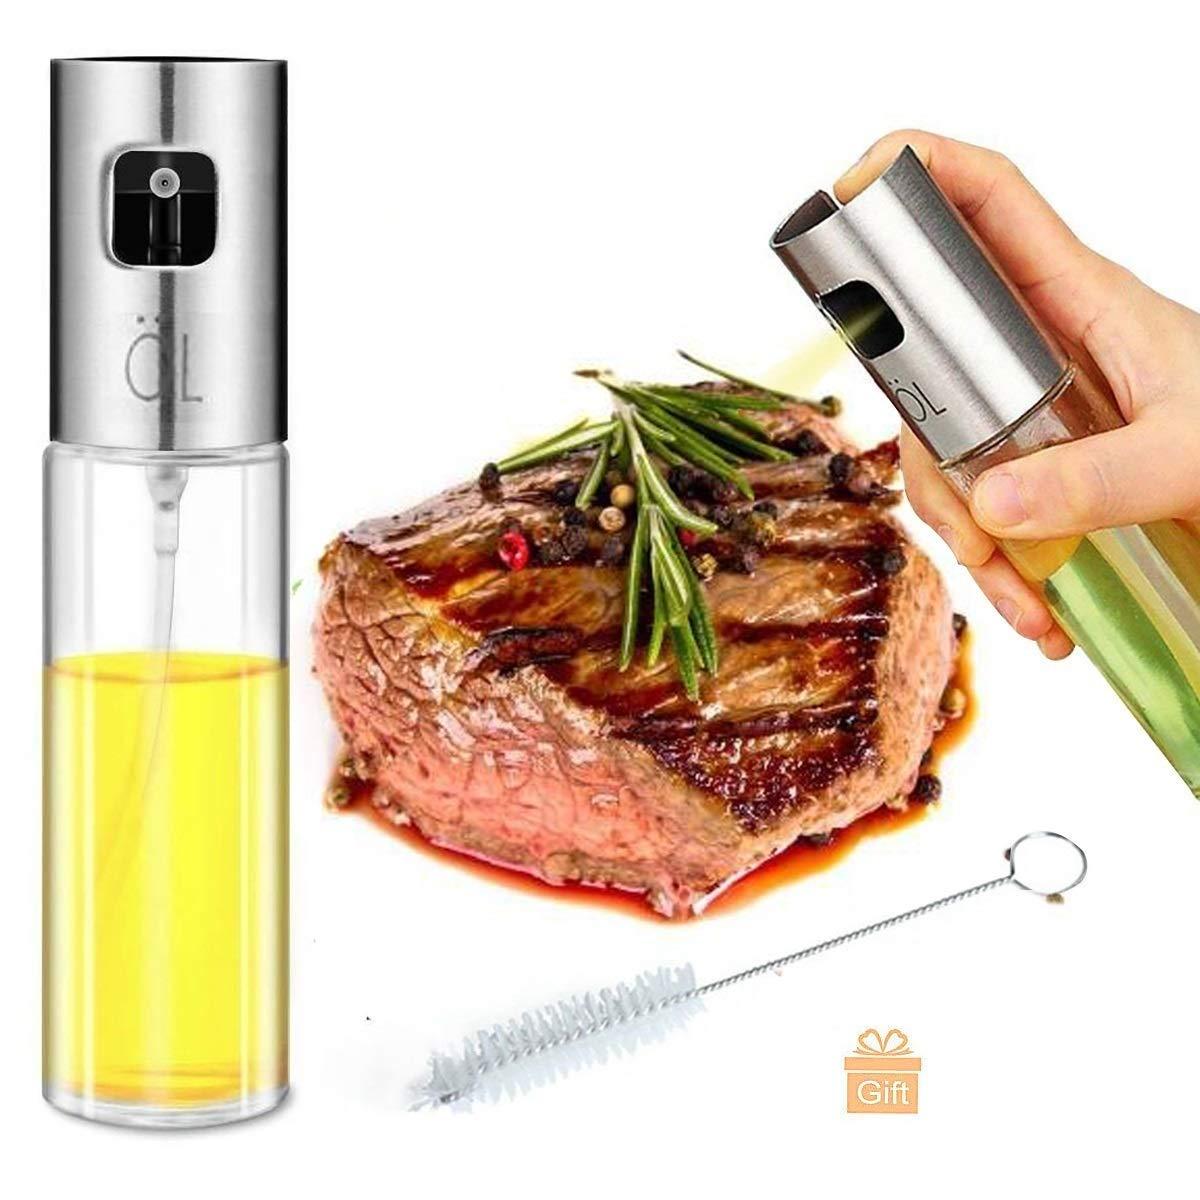 Oil Sprayer for Cooking Olive Oil Sprayer Glass Bottle Kitchen Oil/Vinegar Dispenser with Cleaning Brush for BBQ, Cooking, Grilling, Baking, Frying 100ML/3.4oz